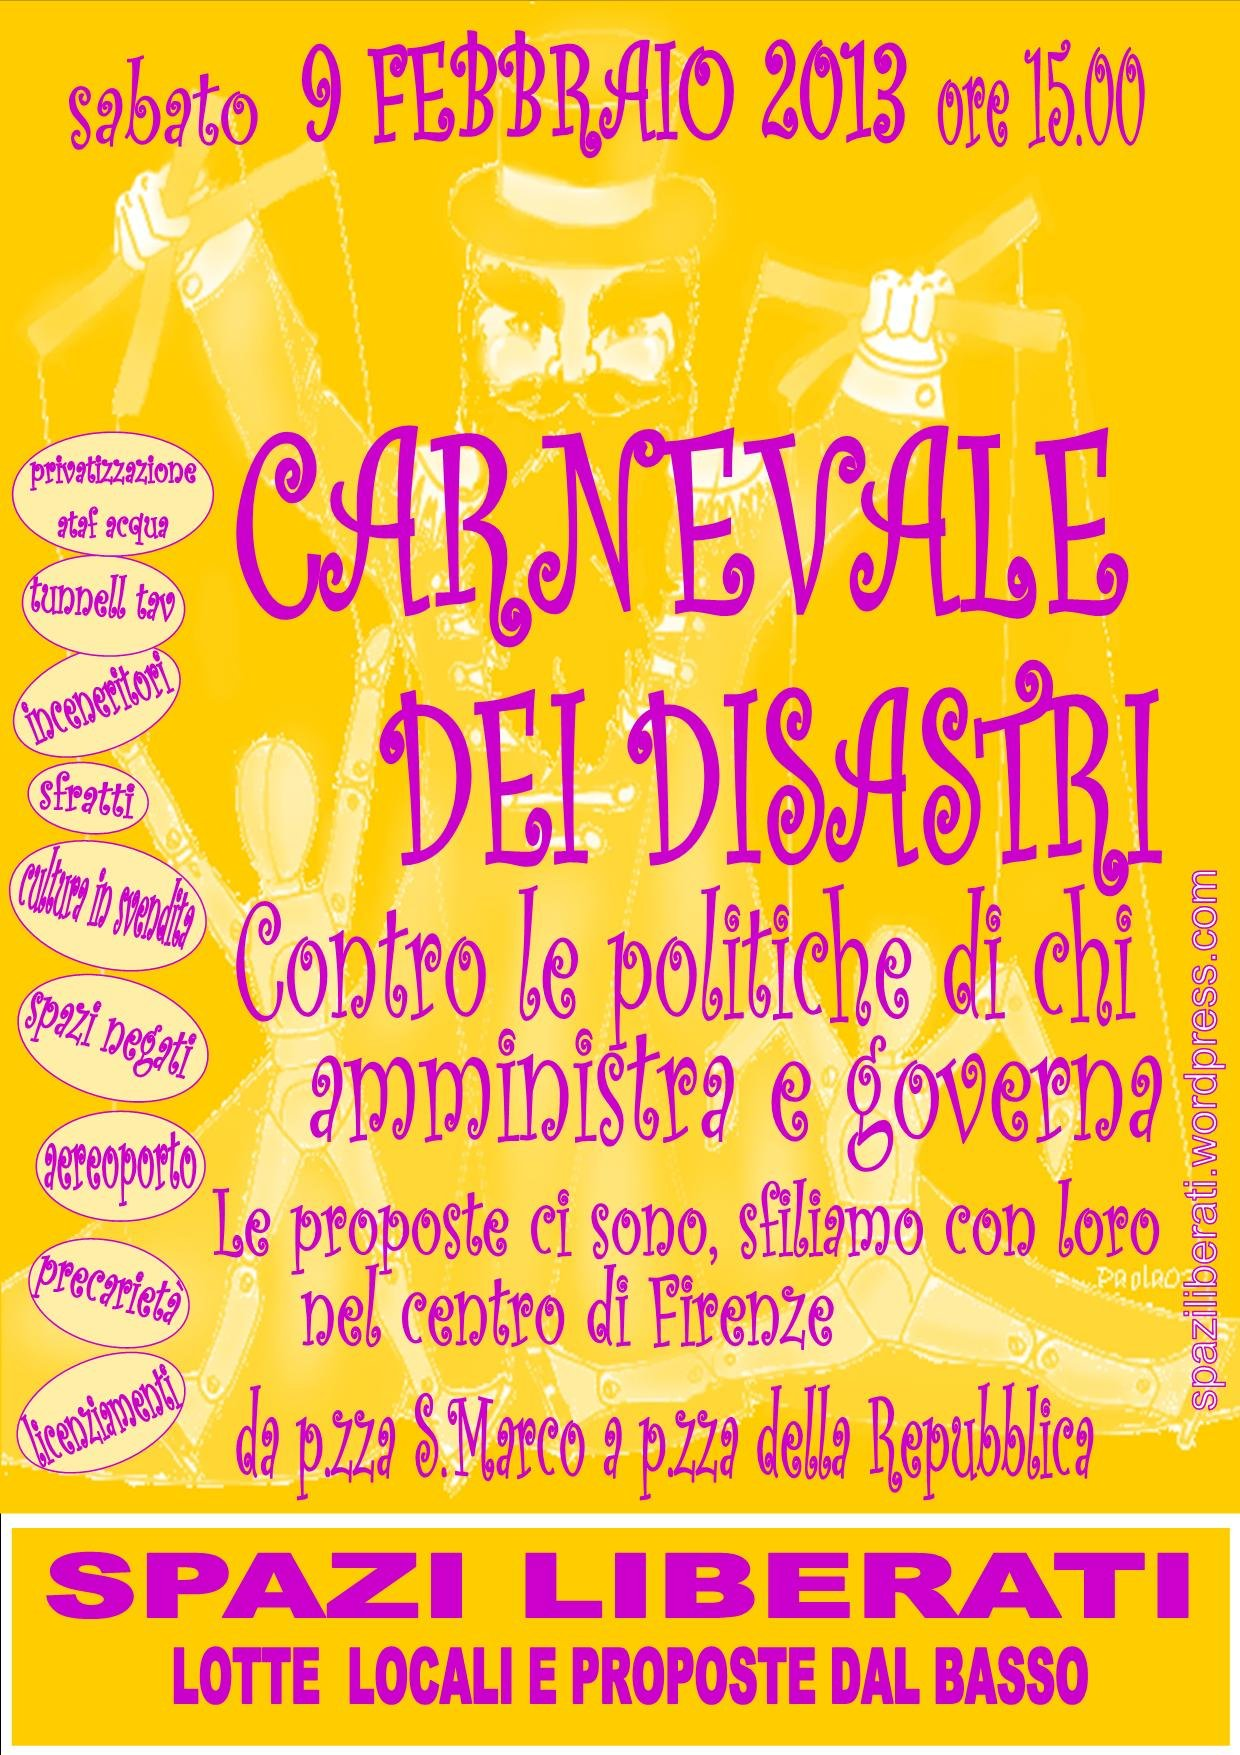 carnevale_disastri_a4_mod2